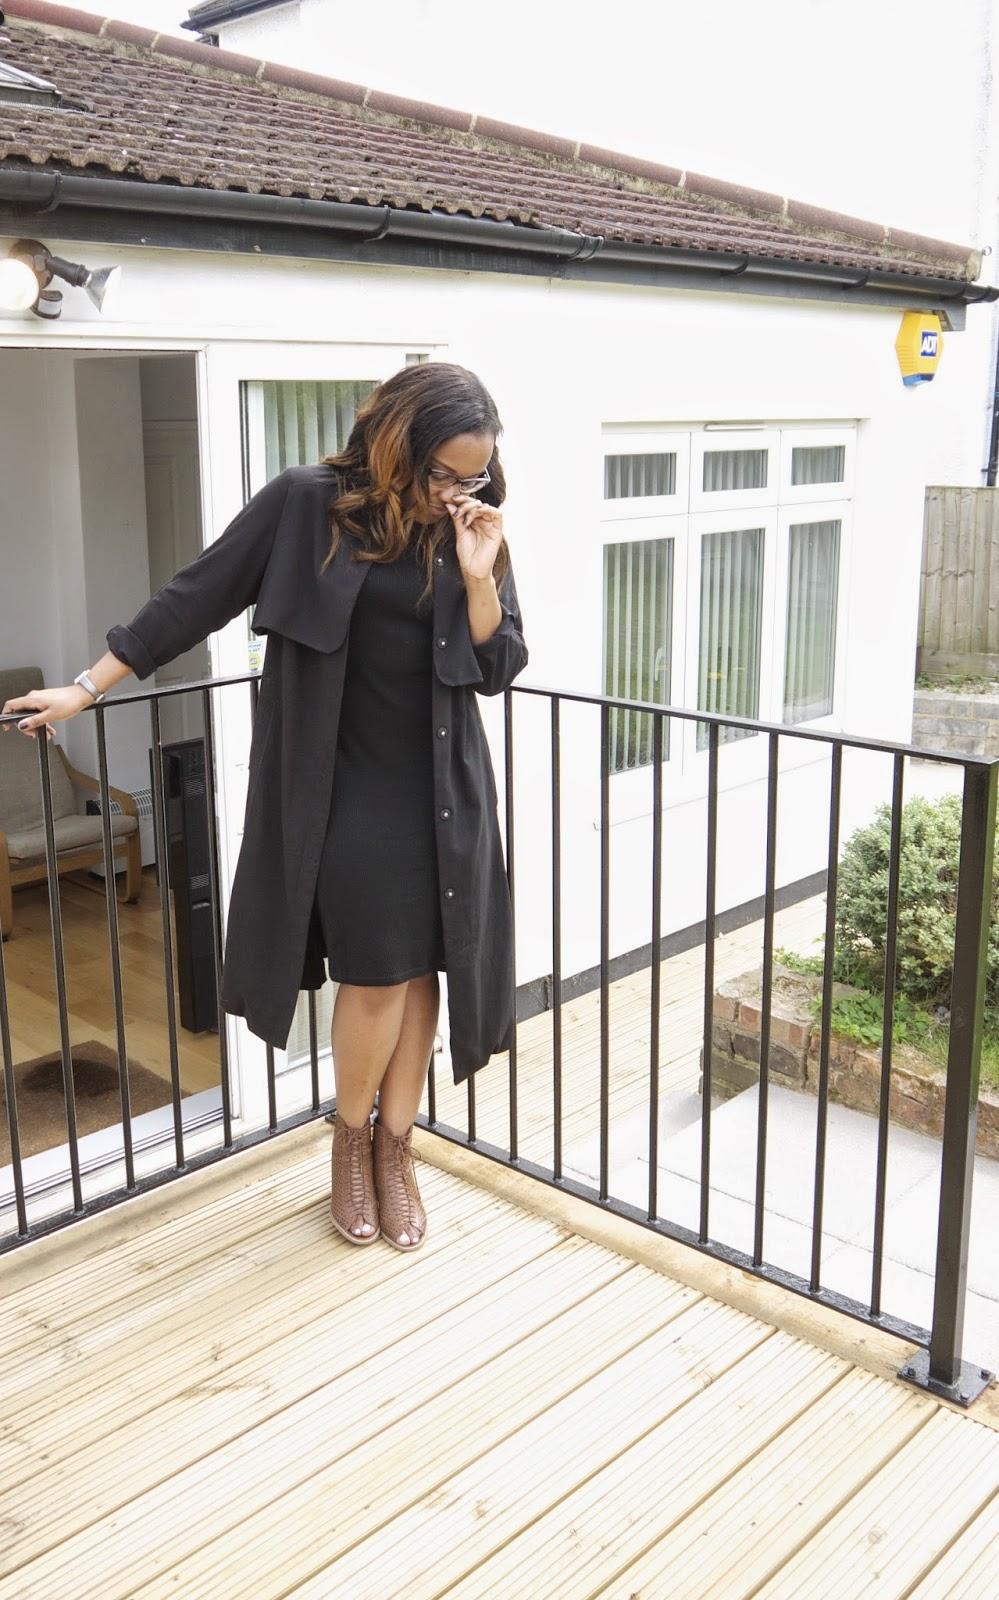 Asks Black Turtle Neck Midi Dress Black H&M HM Duster Coast Forever 21 Lace Up Peep Toe Sandals